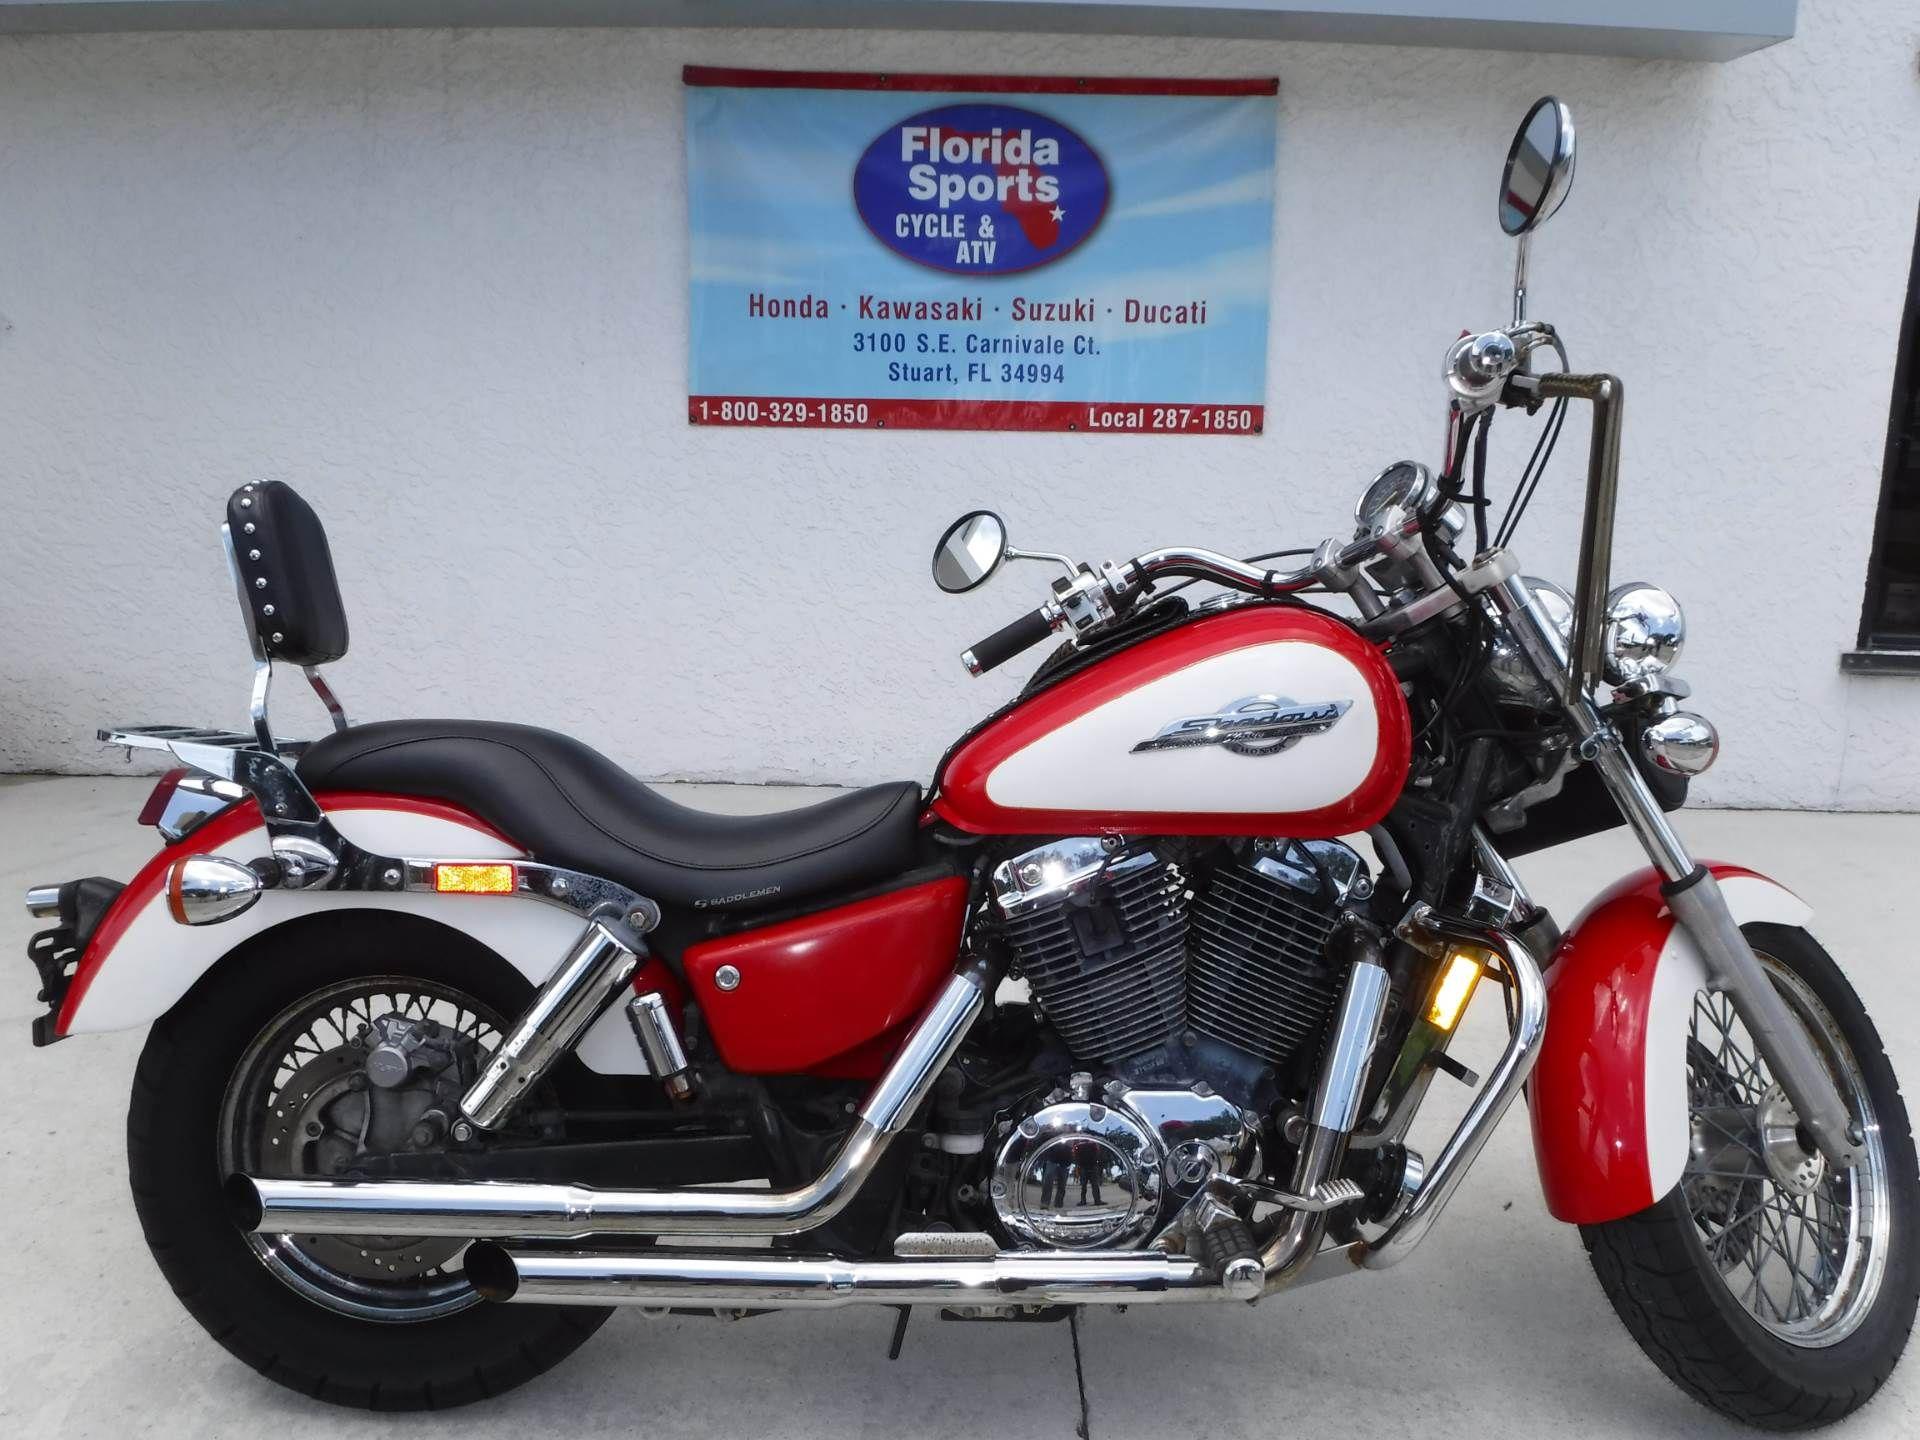 1996 honda shadow 1100 ace motorcycles stuart fl at geebo [ 1920 x 1440 Pixel ]